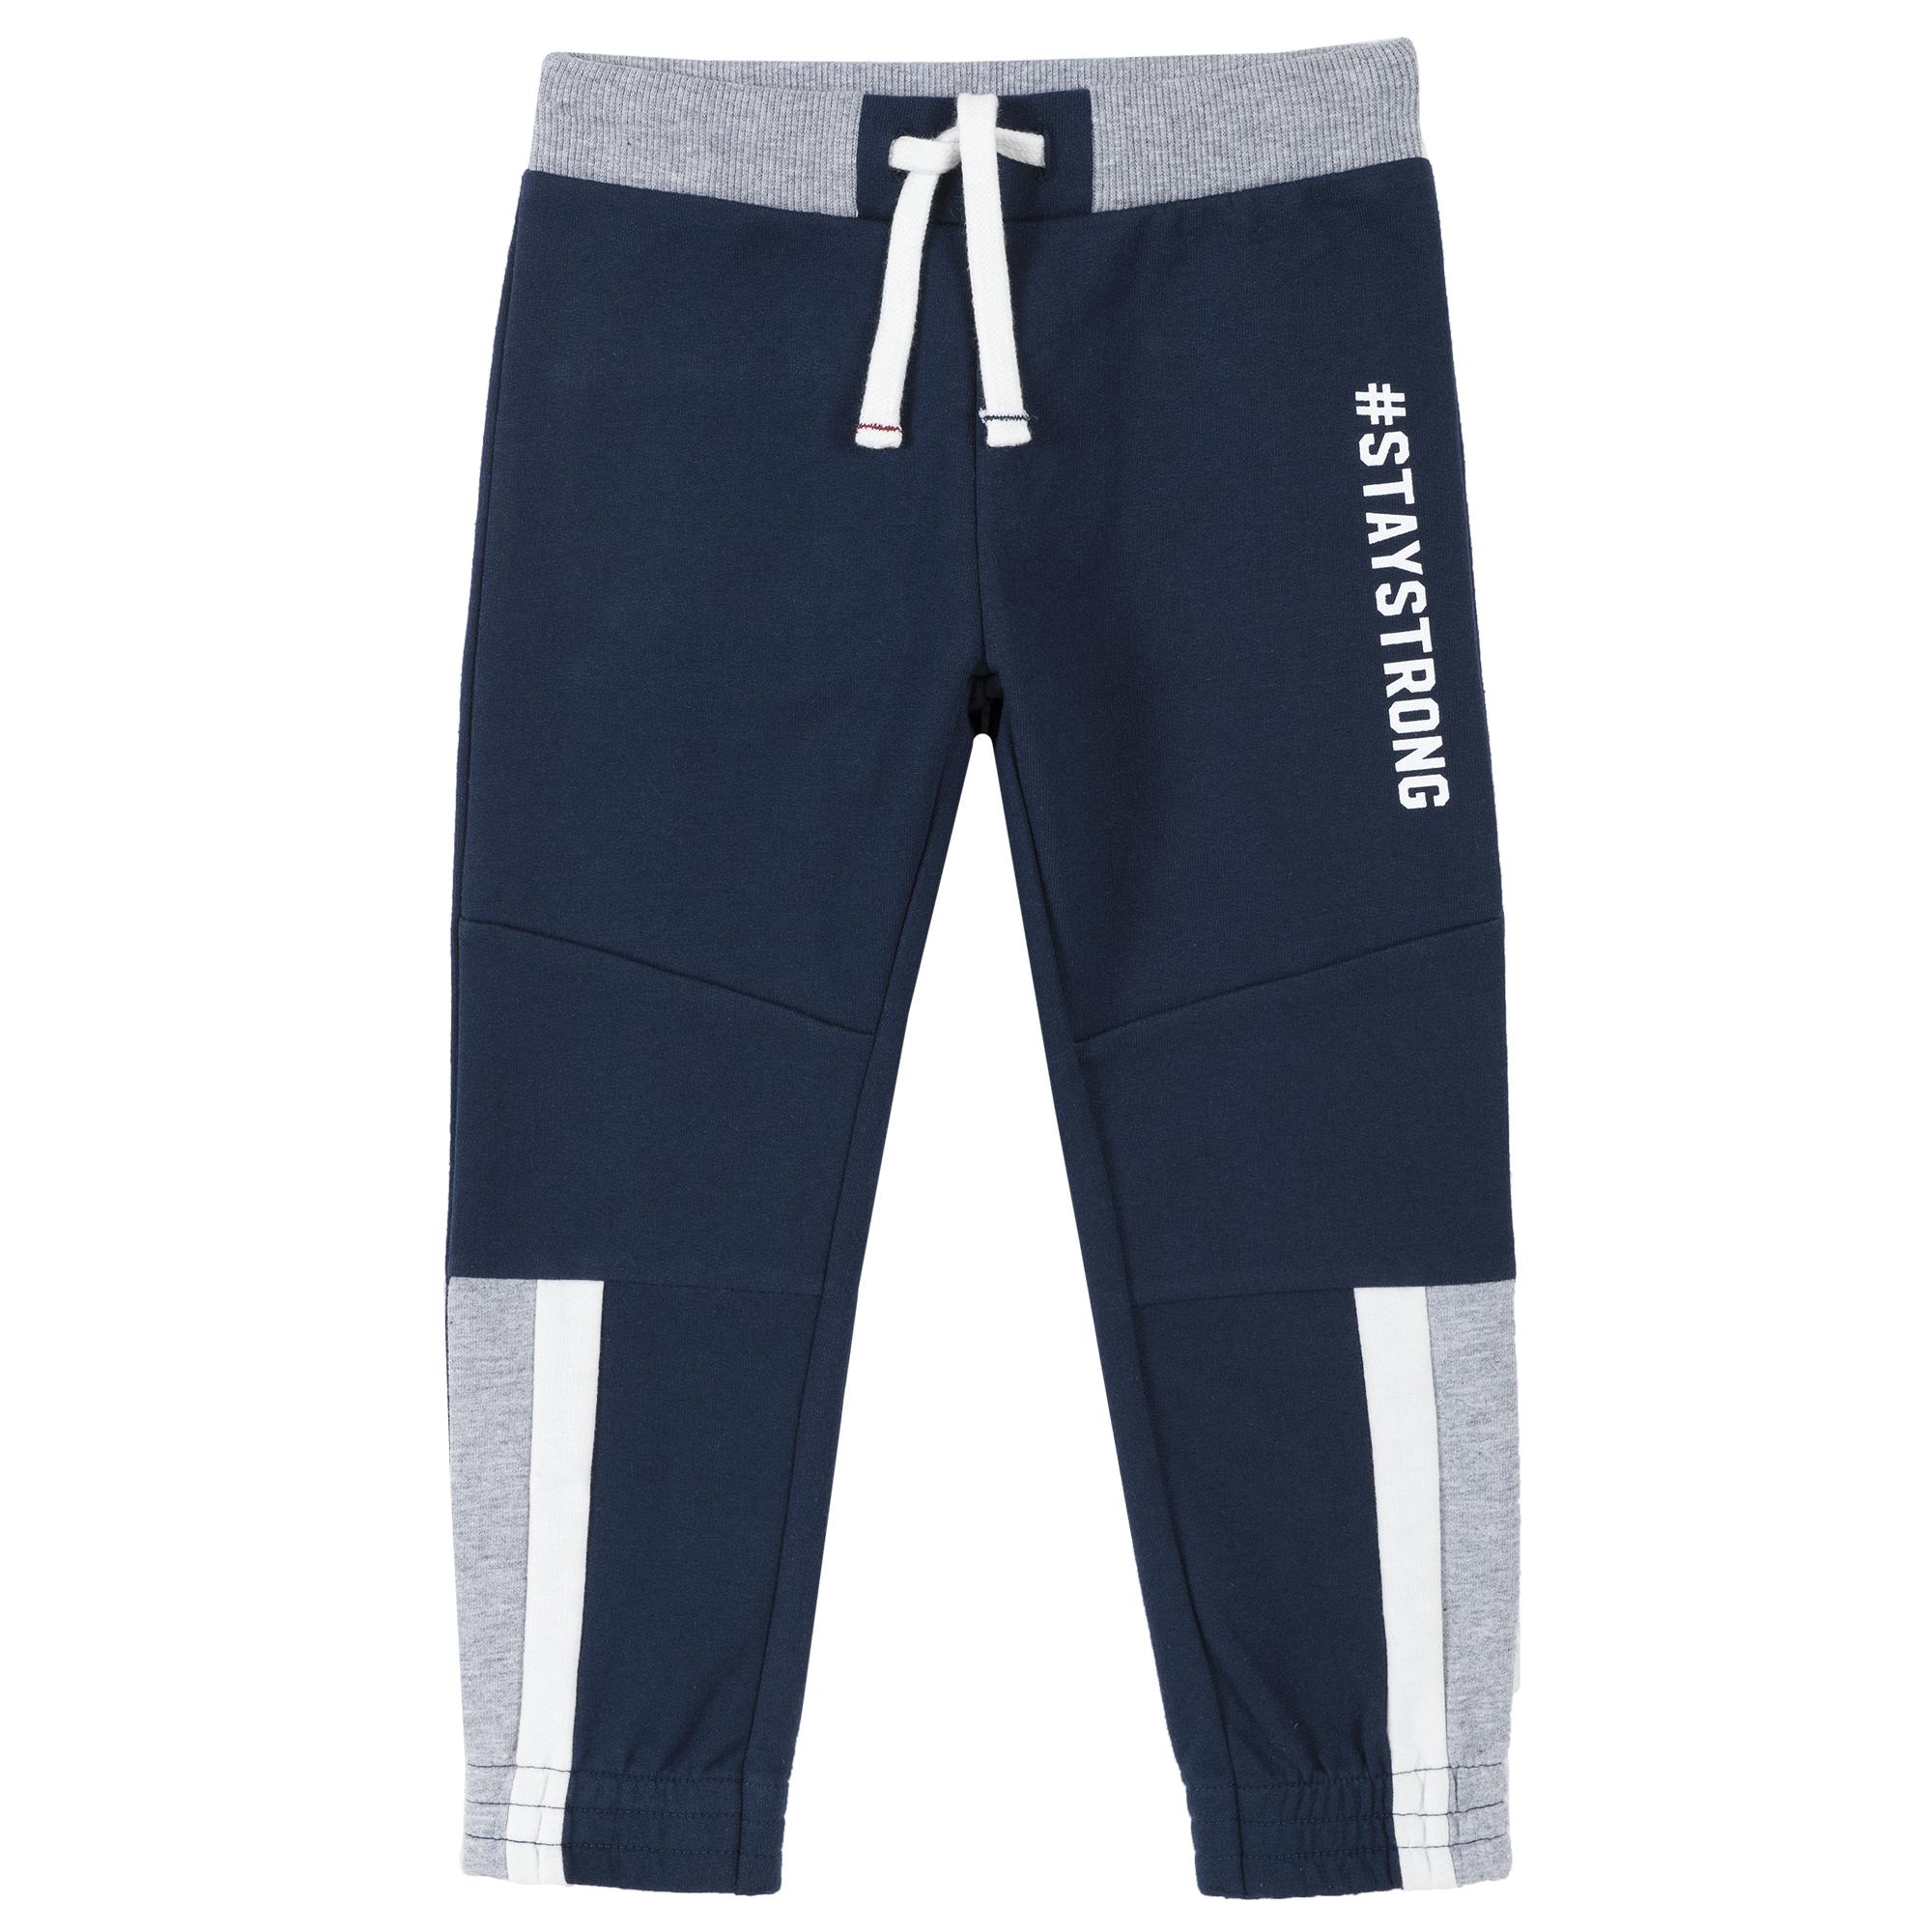 Pantalon trening copii Chicco, albastru inchis, 94611 din categoria Pantaloni copii